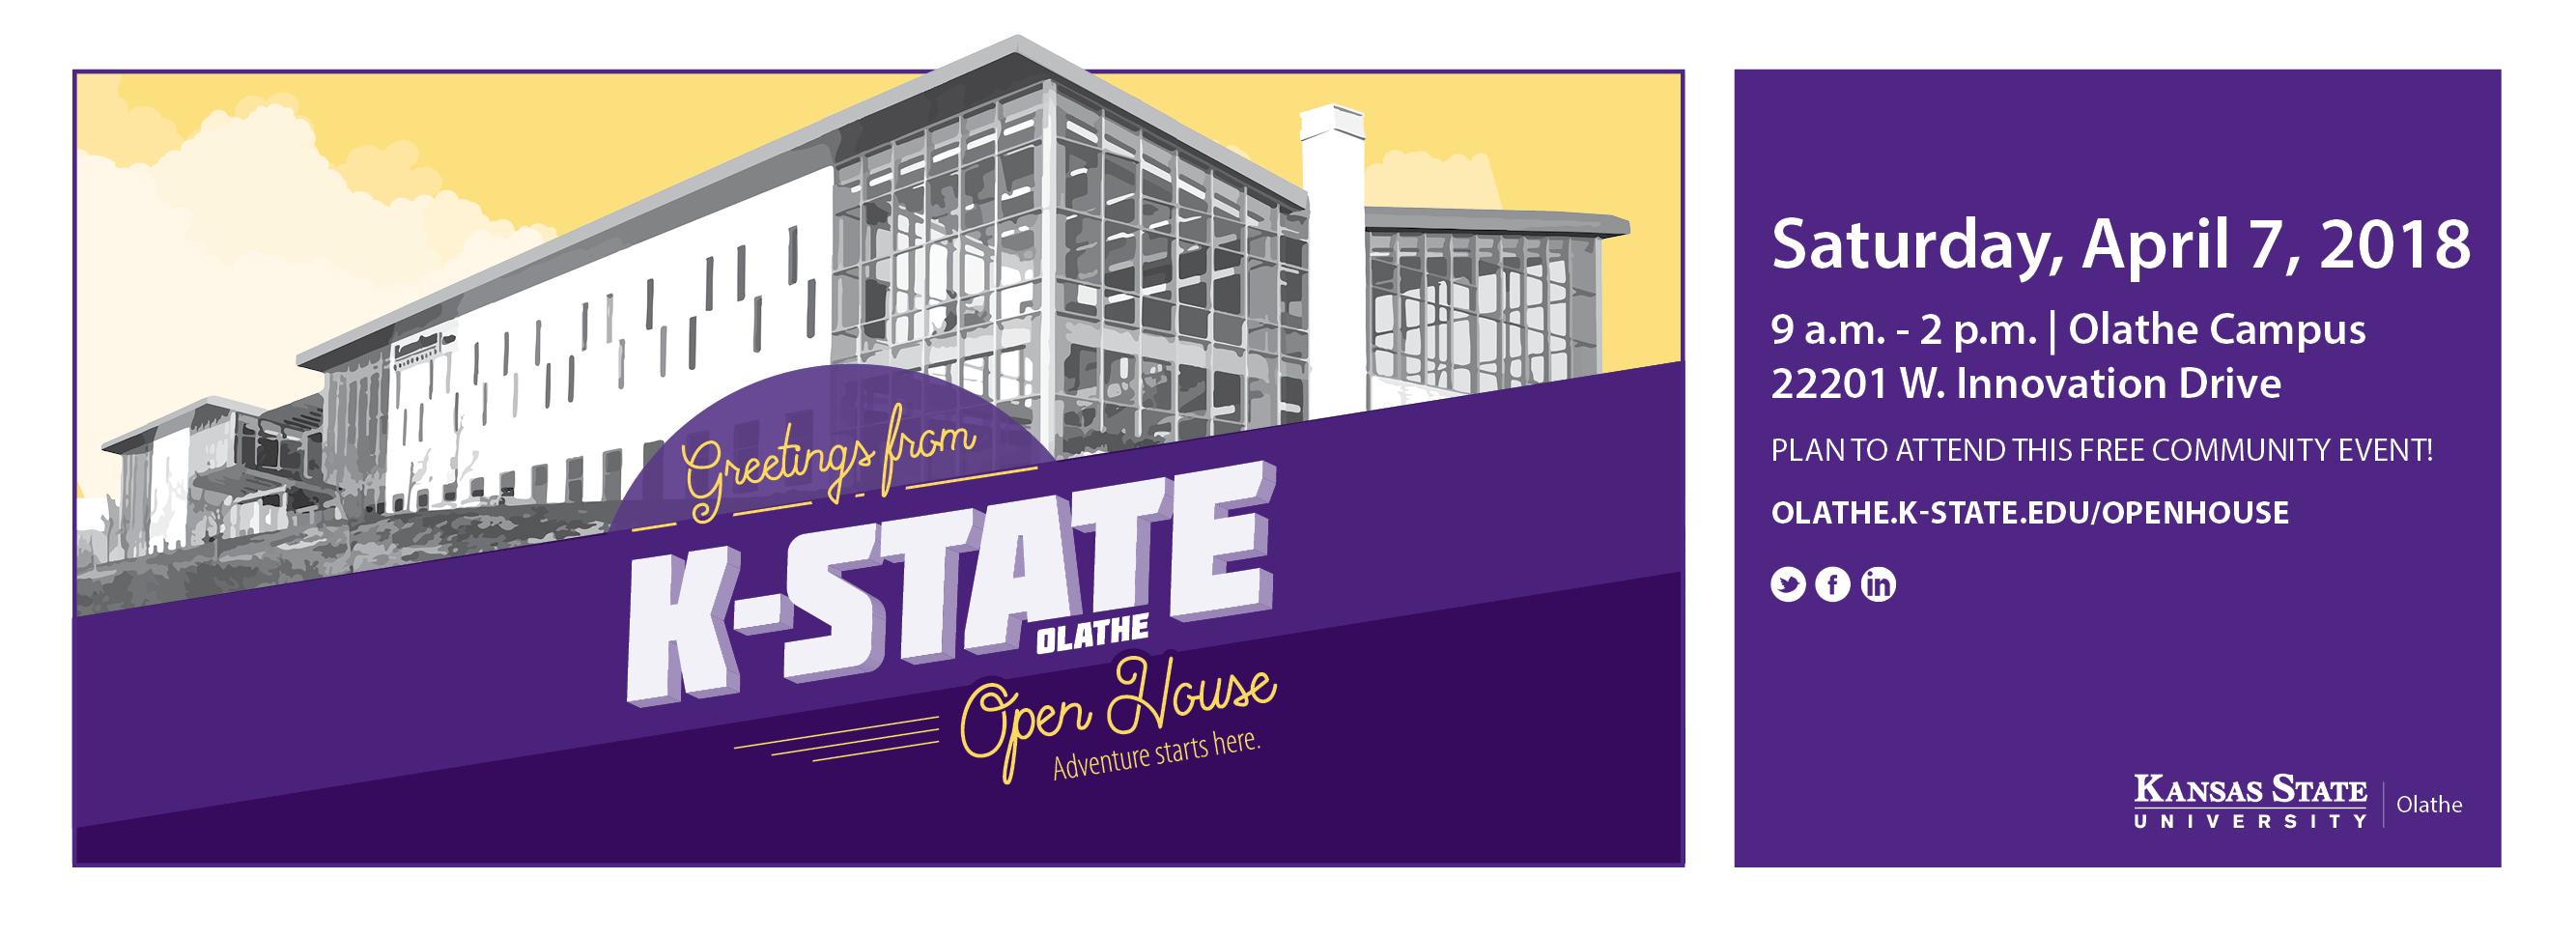 All-University Open House